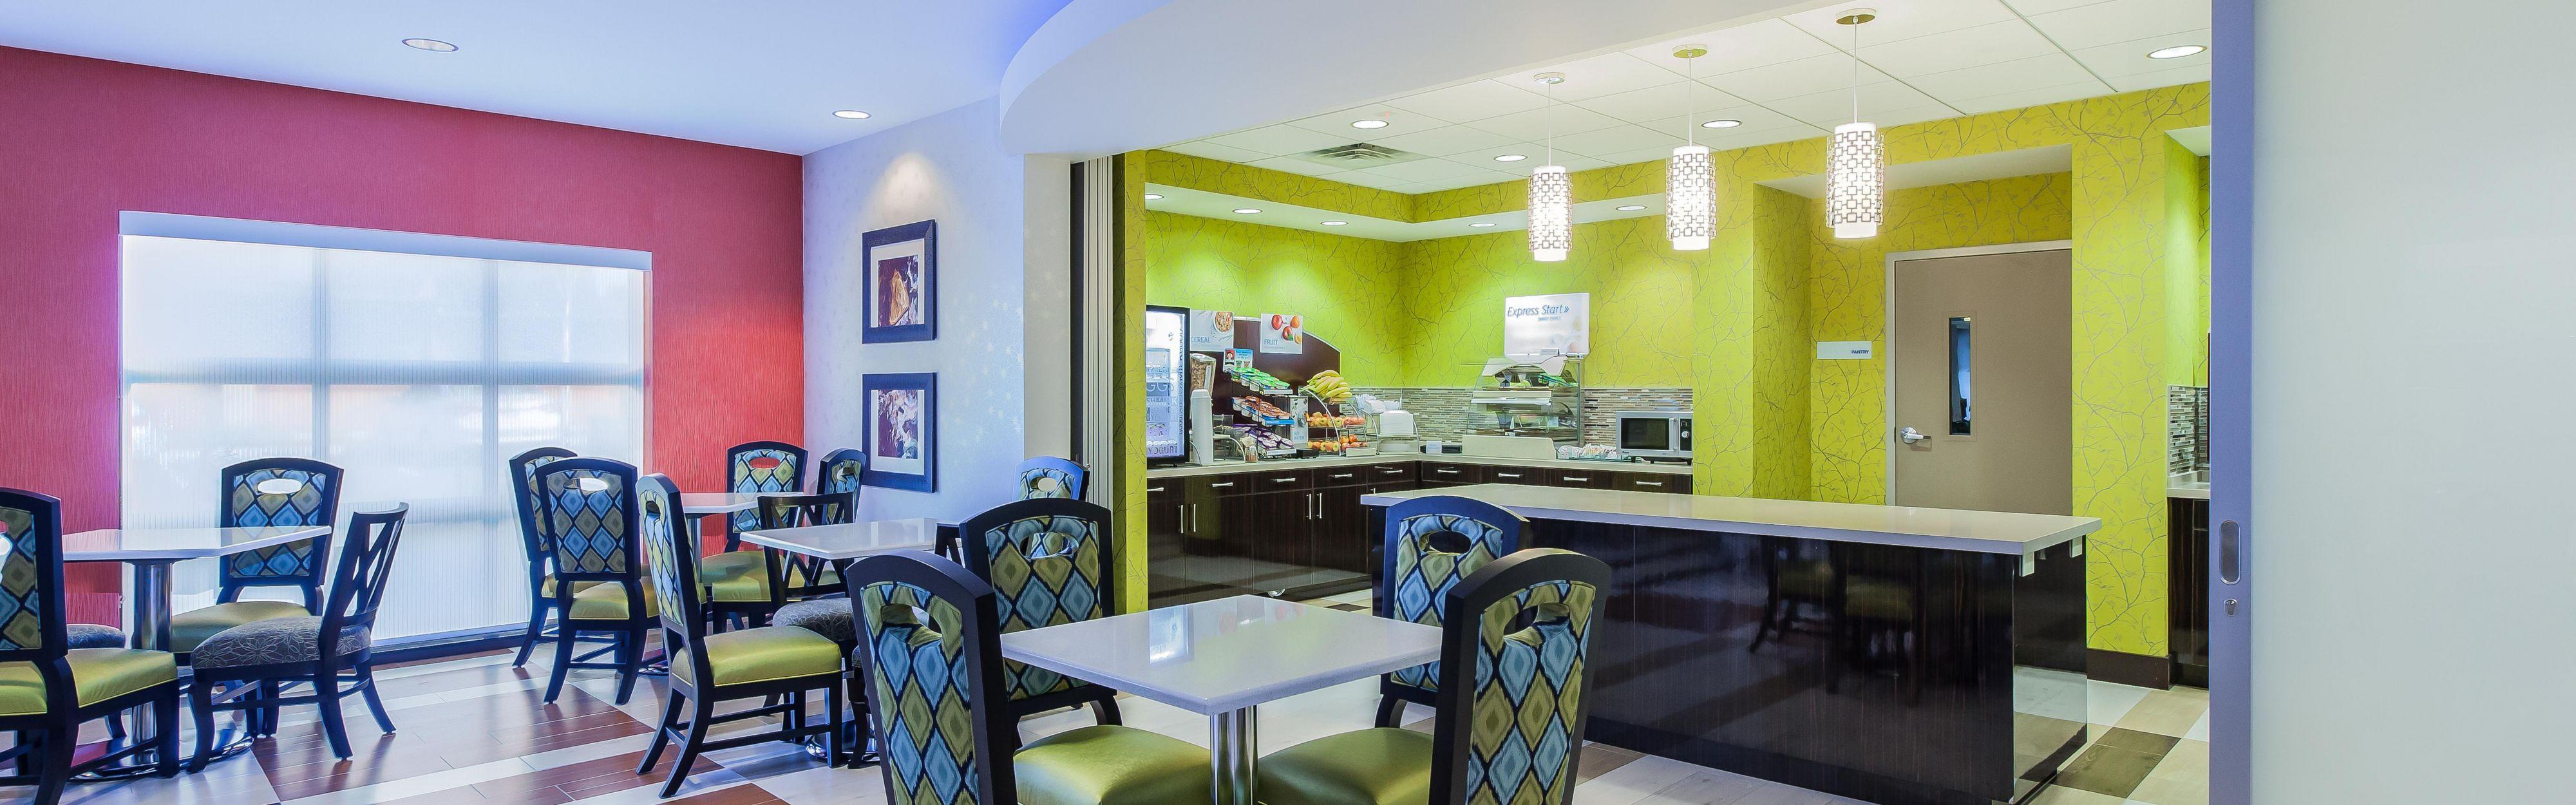 Holiday Inn Express & Suites Eureka image 3